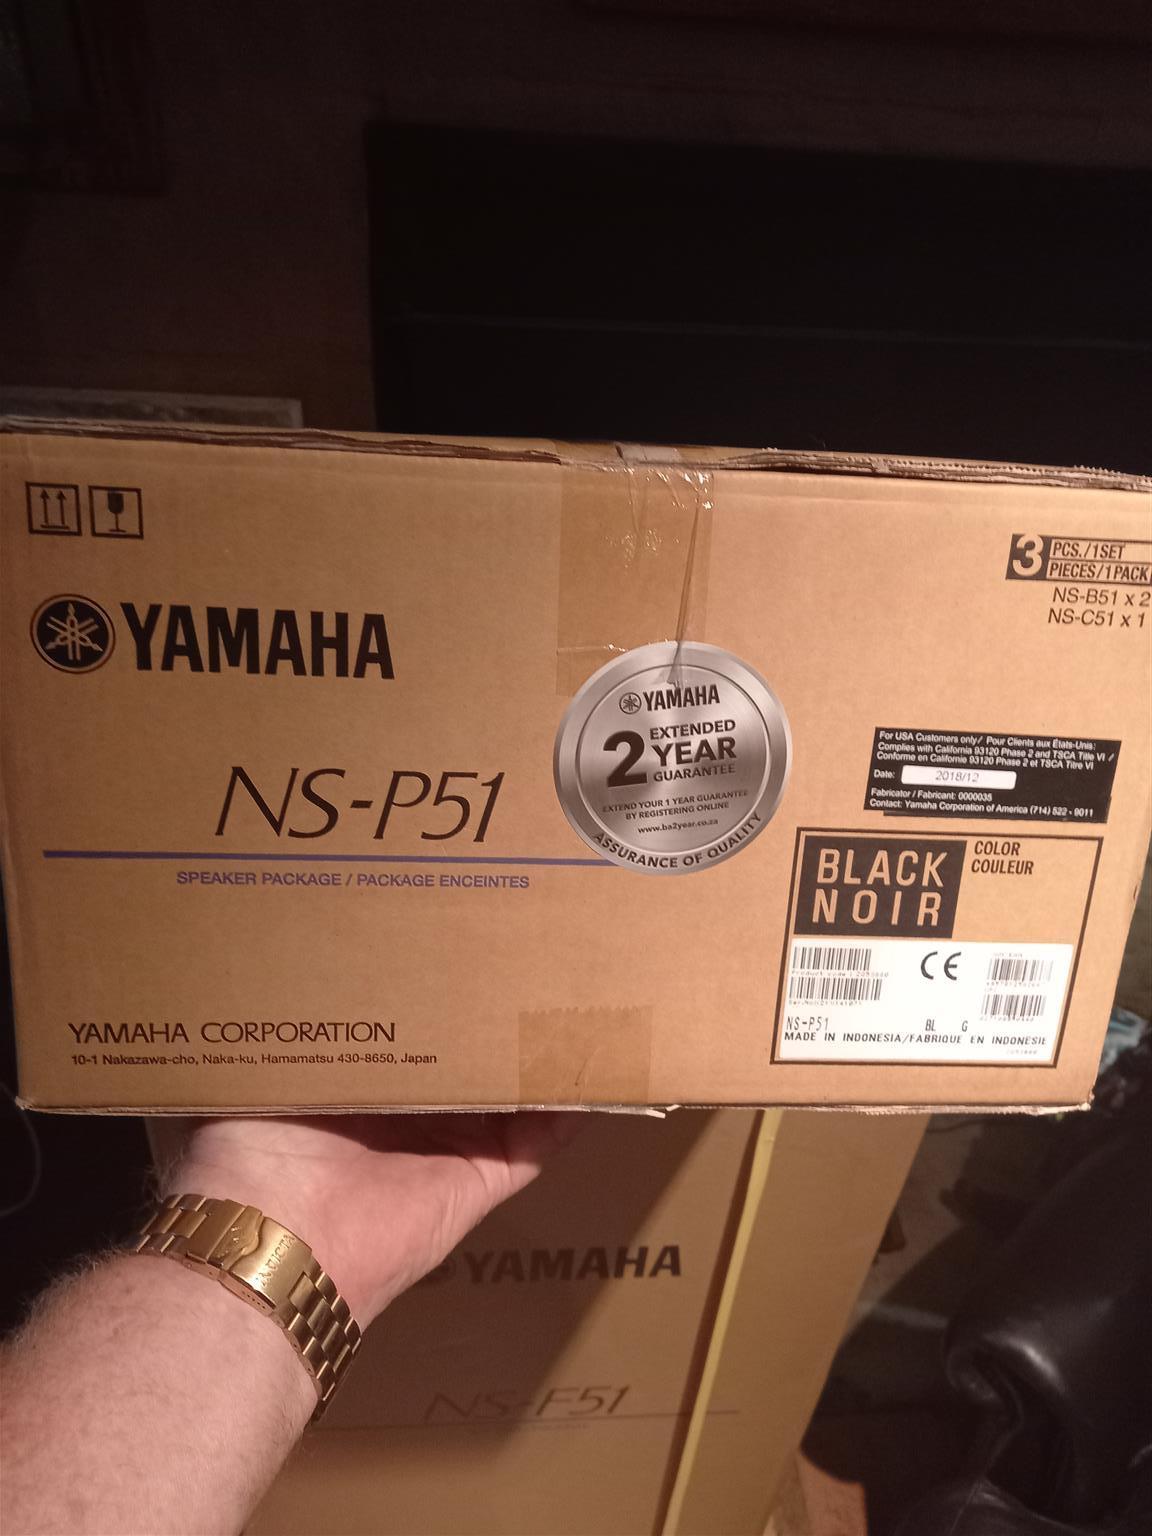 YAMAHA NS-P51 SPEAKERS